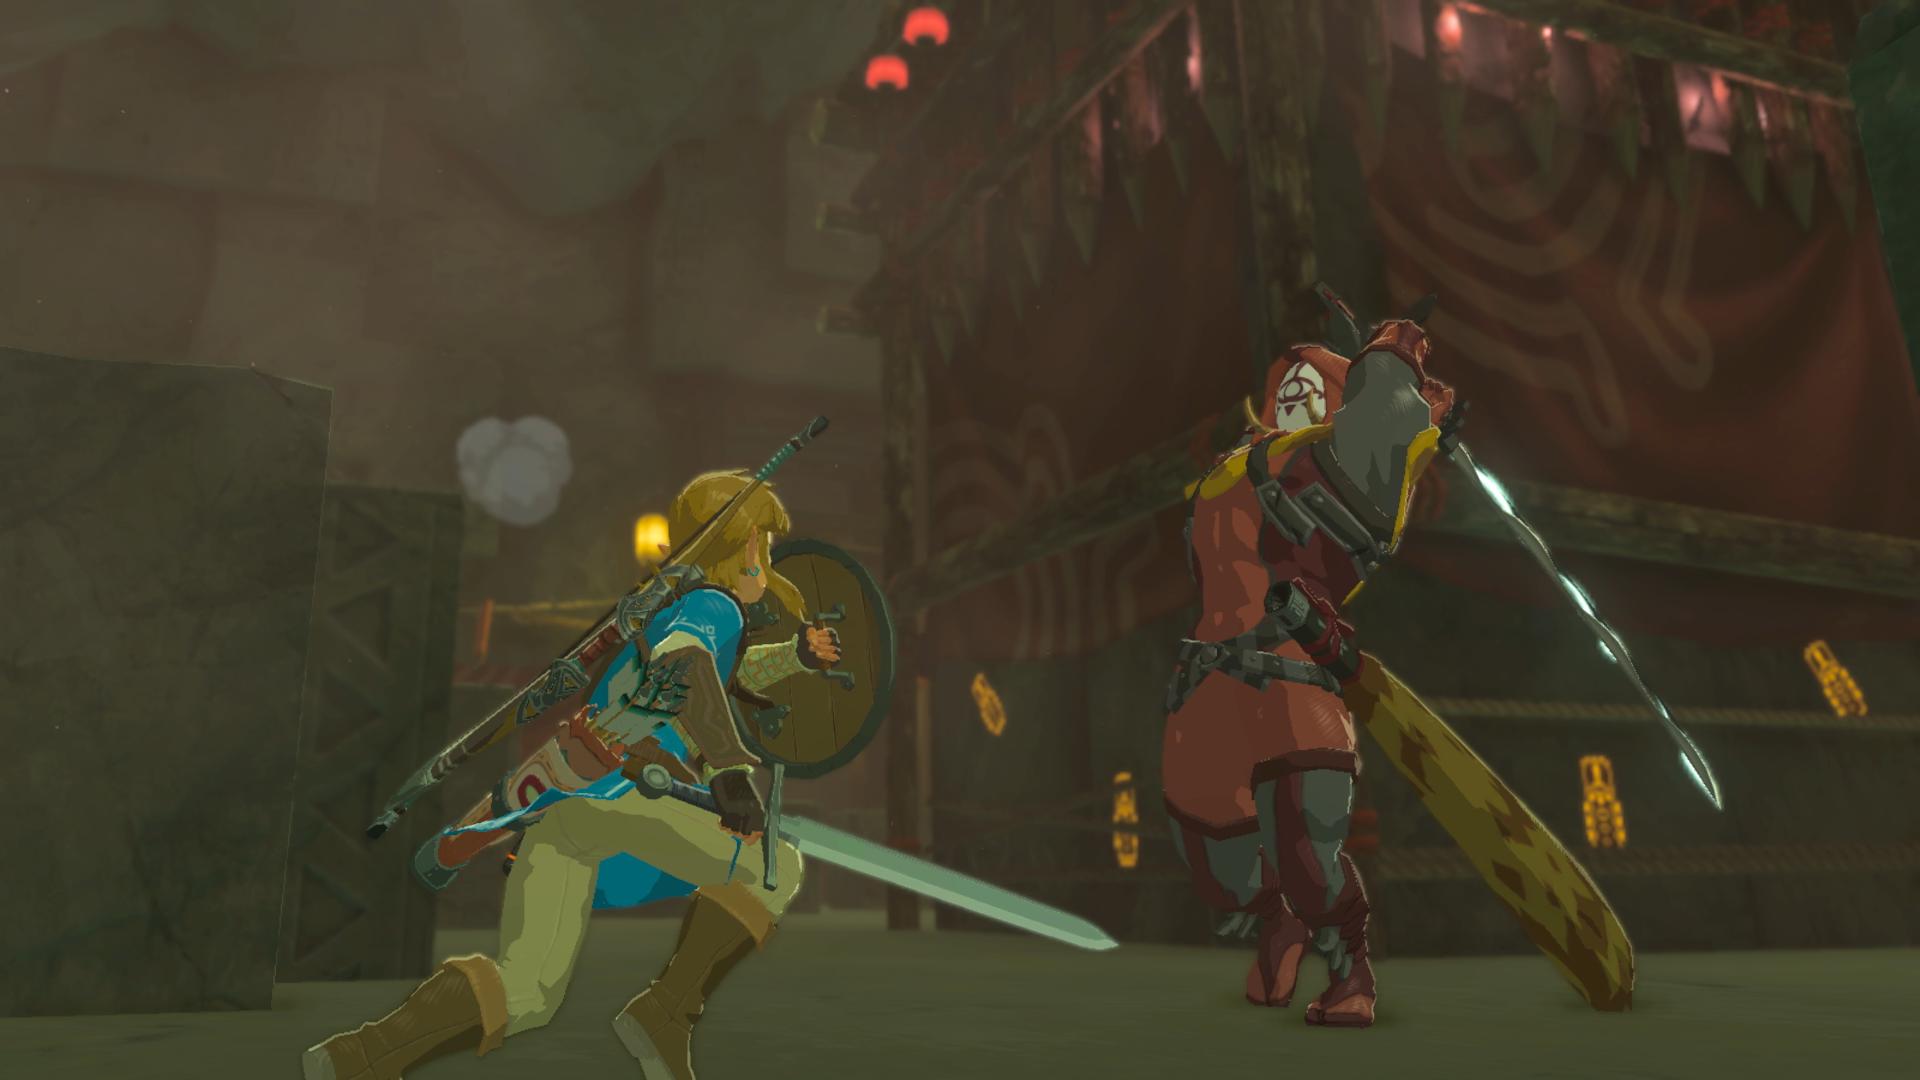 The Legend of Zelda: Breath of the Wild image 25